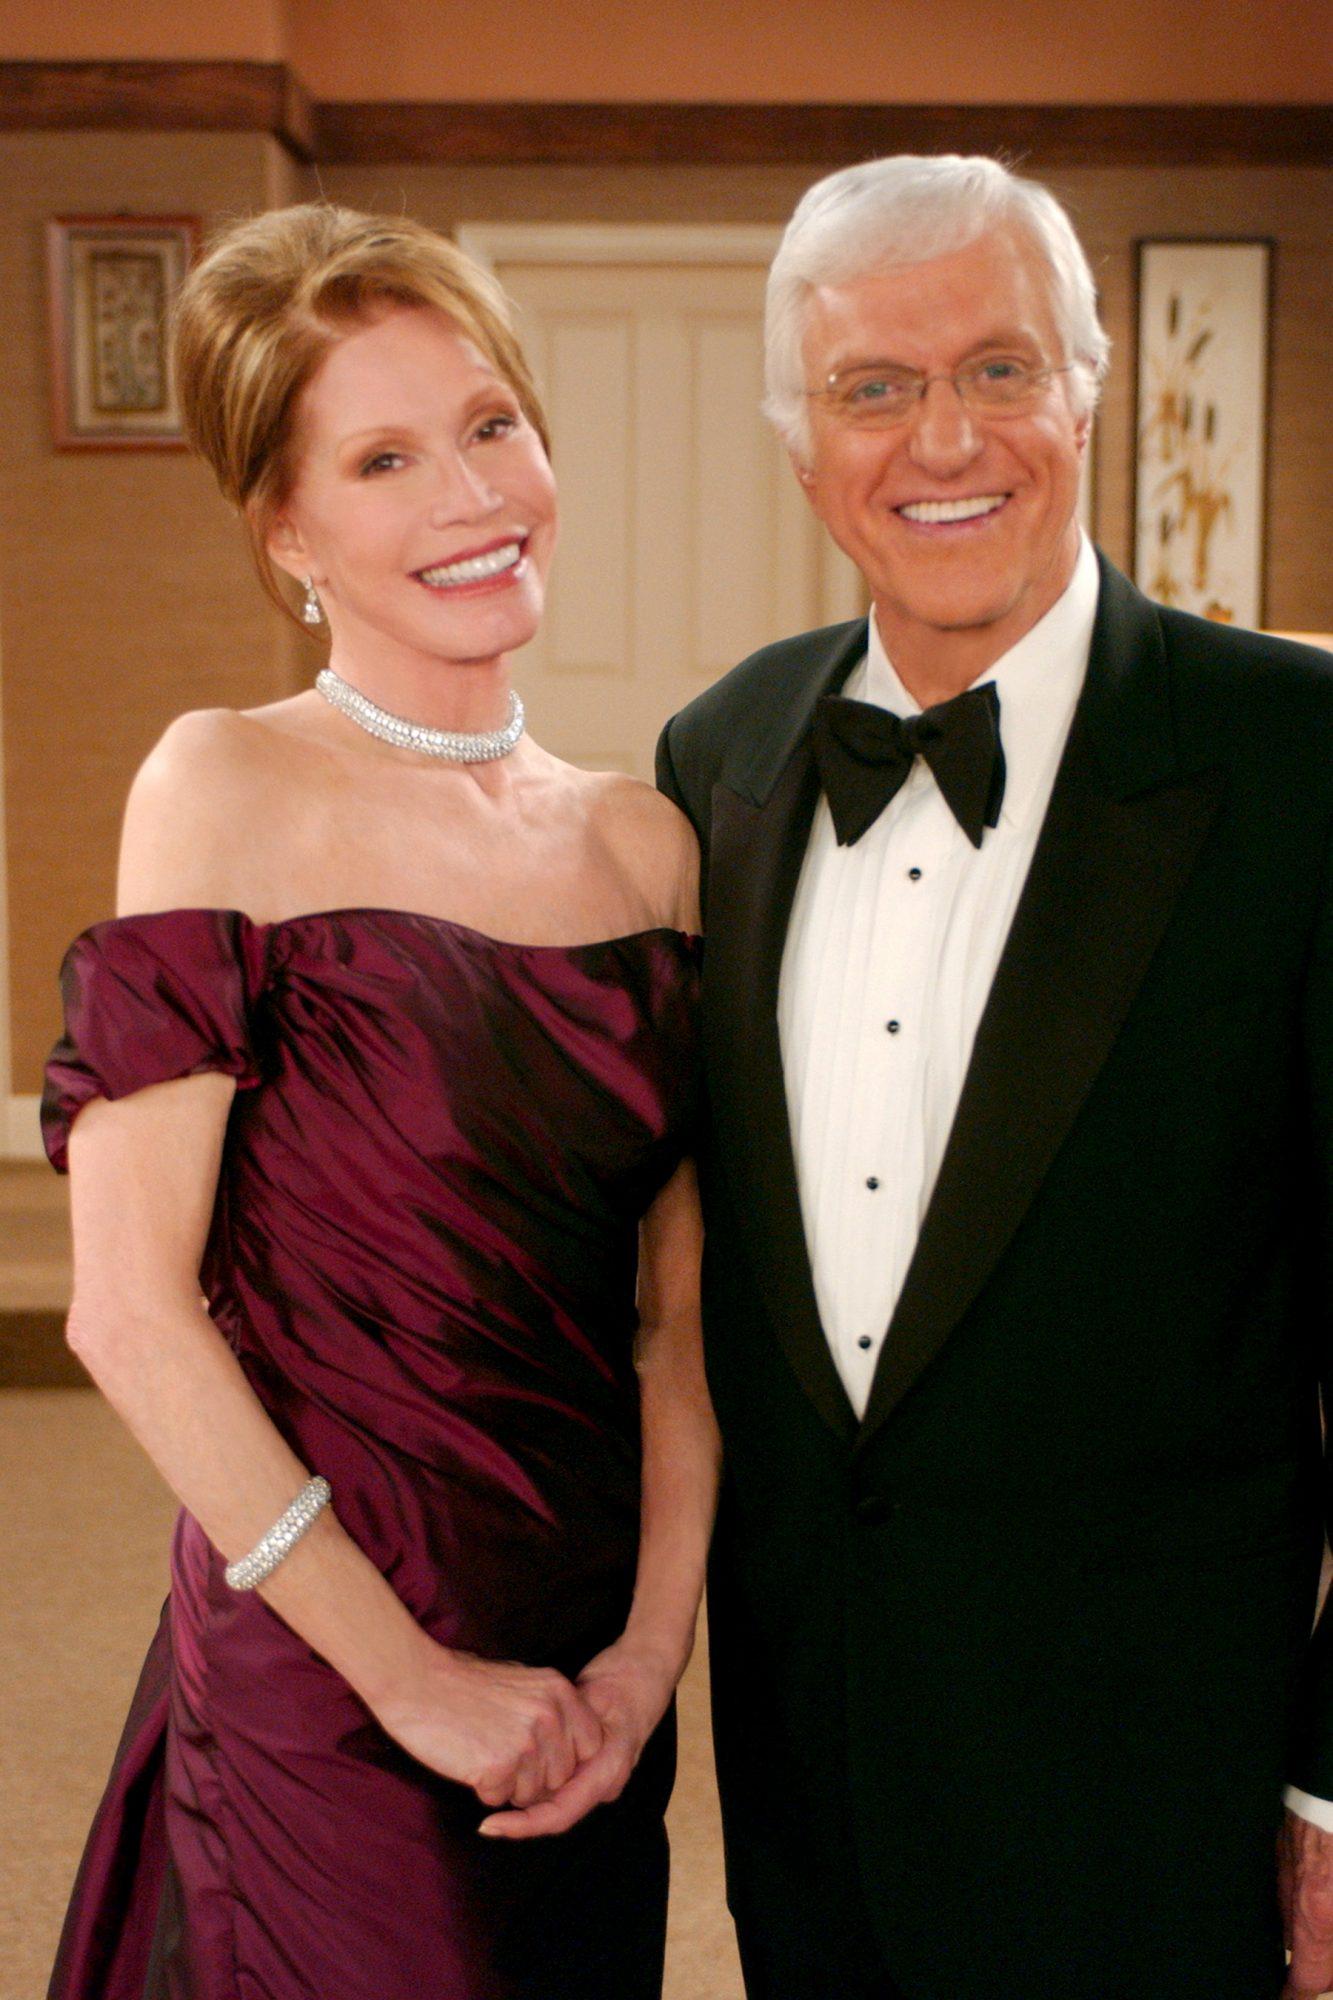 Portrait Of Laura & Rob Petrie